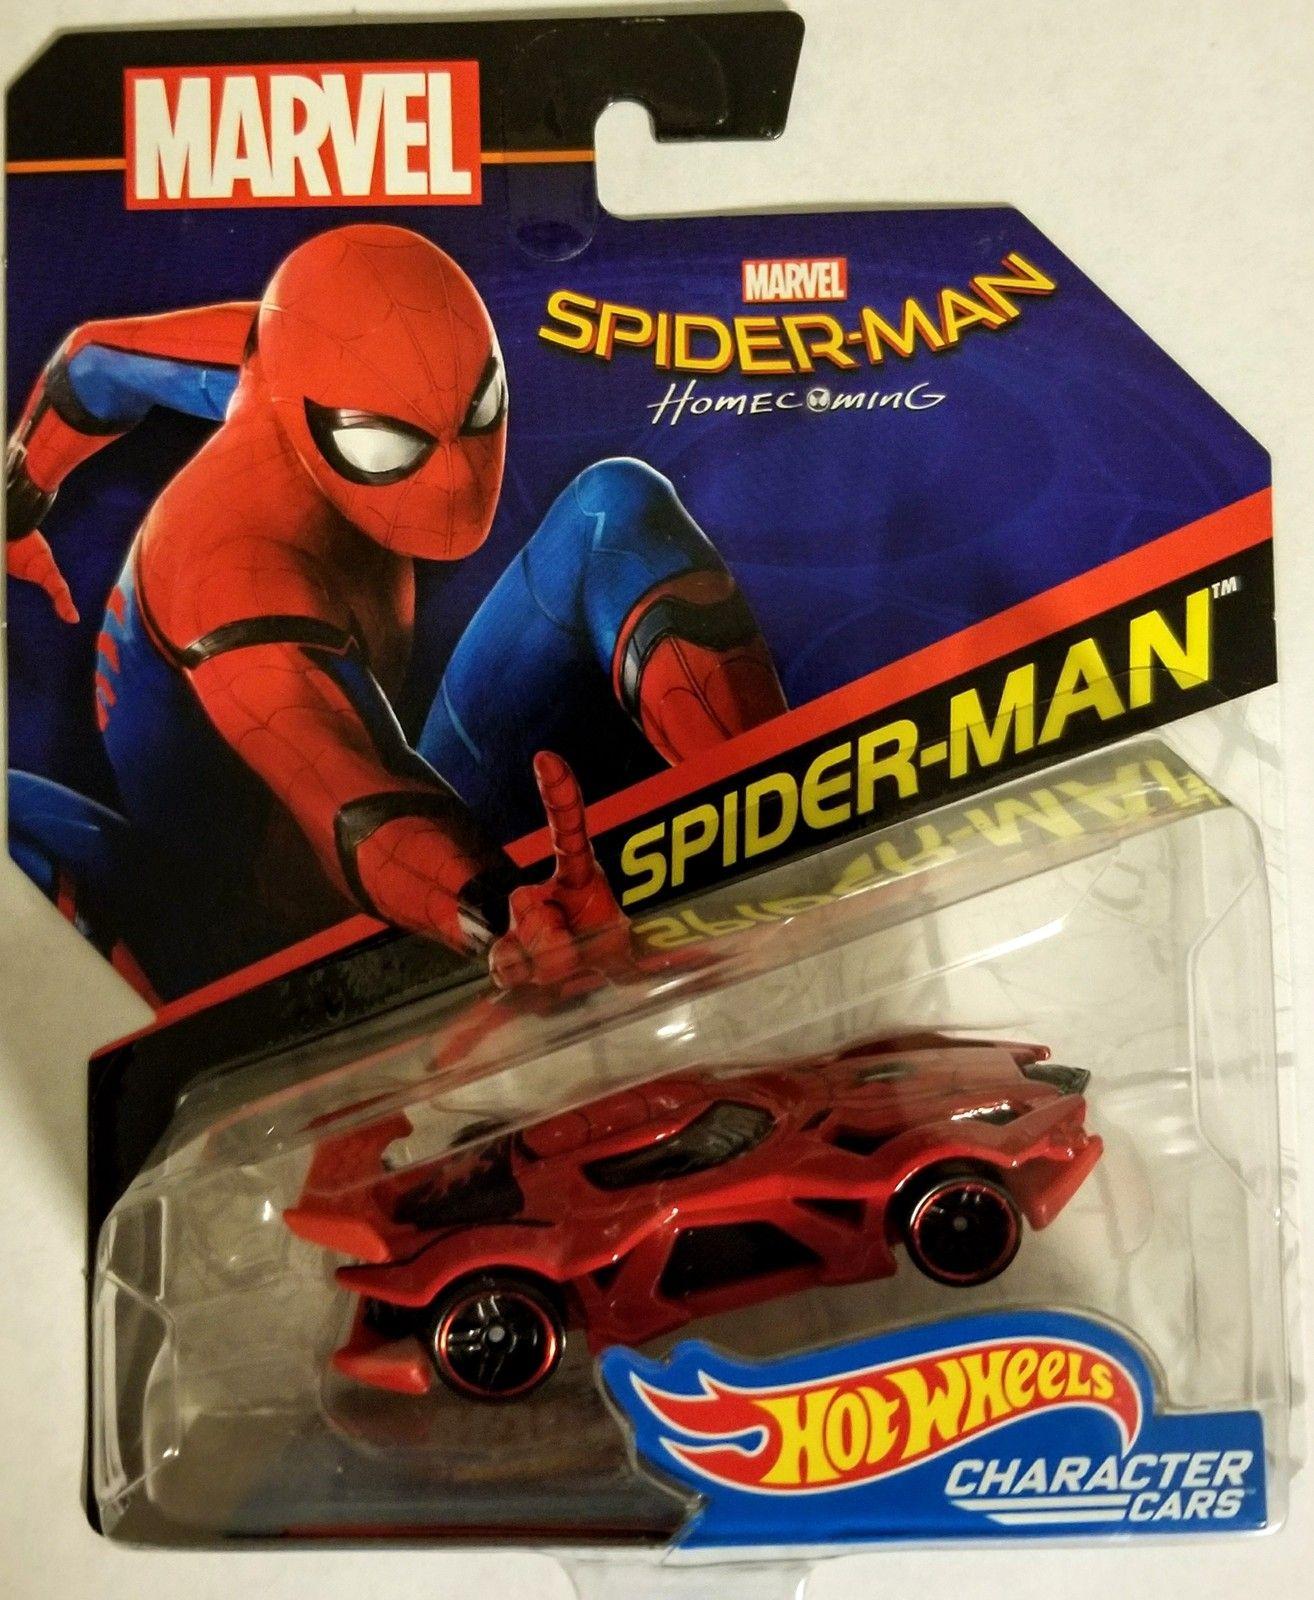 7ae3957c Hot Wheels Marvel Comics SPIDER-MAN Home Coming Character Car Hot Wheels  Marvel Comics SPIDER